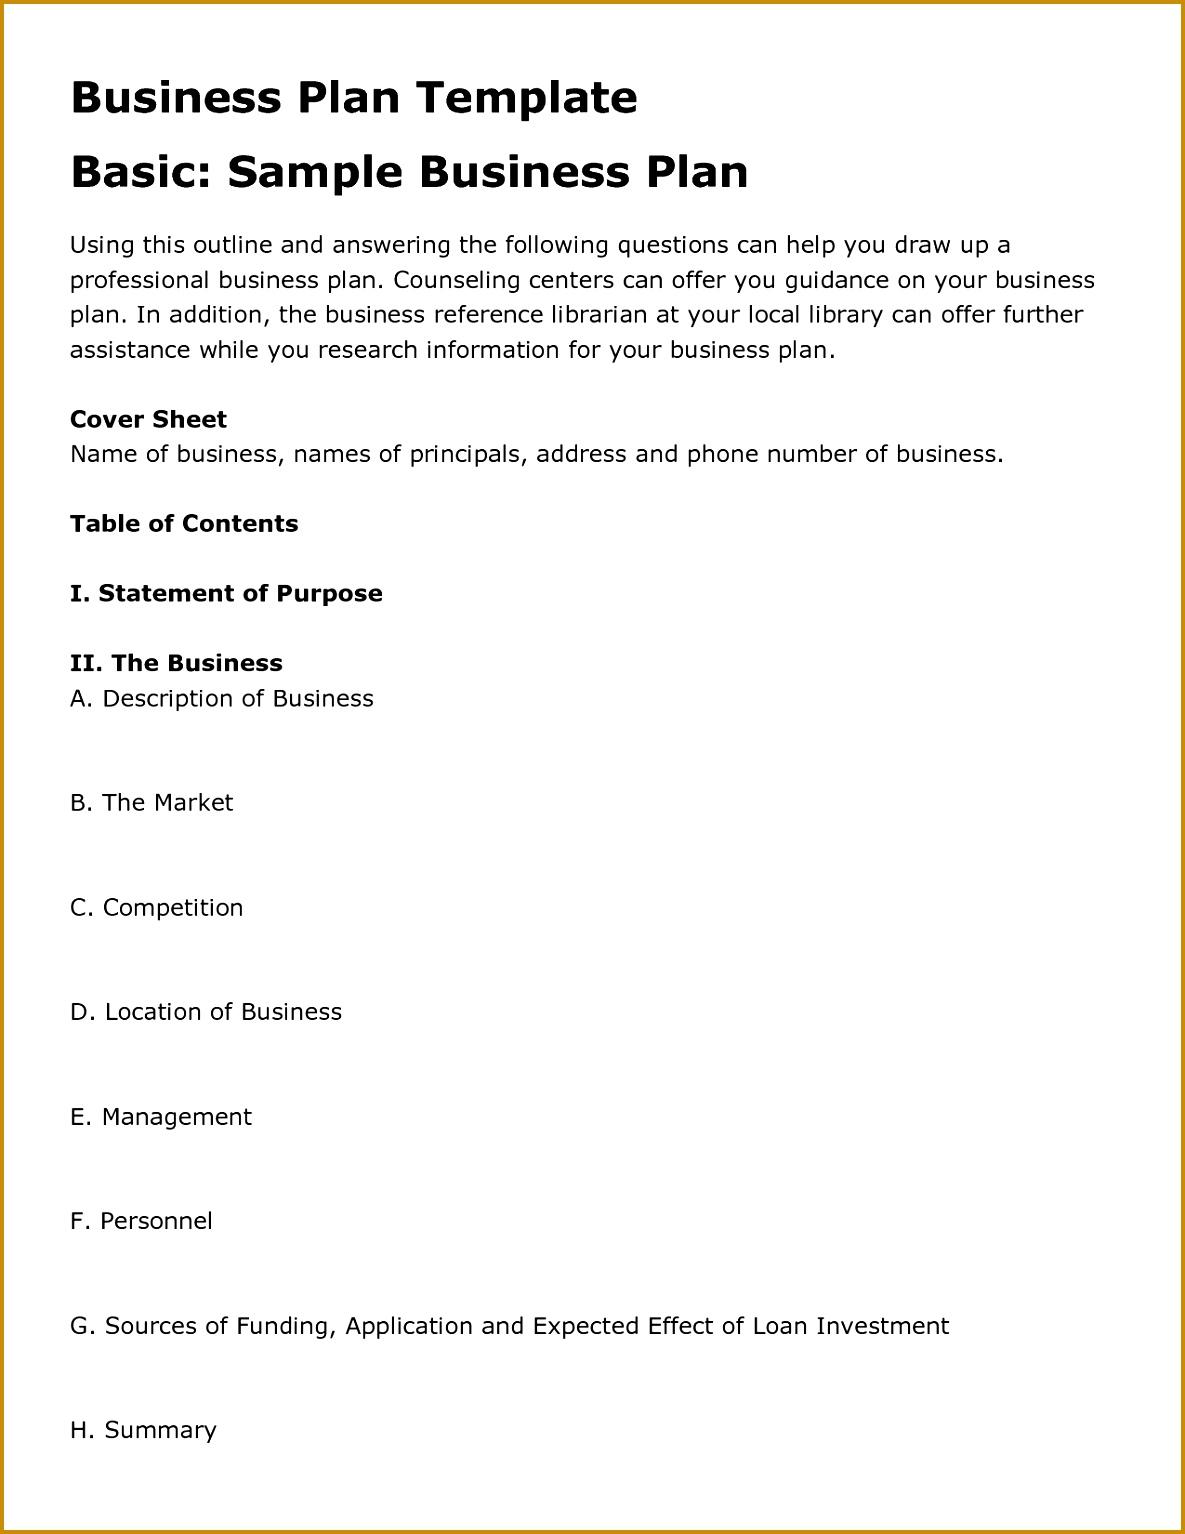 restaurant business plan pdf free sample daycare business plan pdf sample business plan for restaurant 15341185